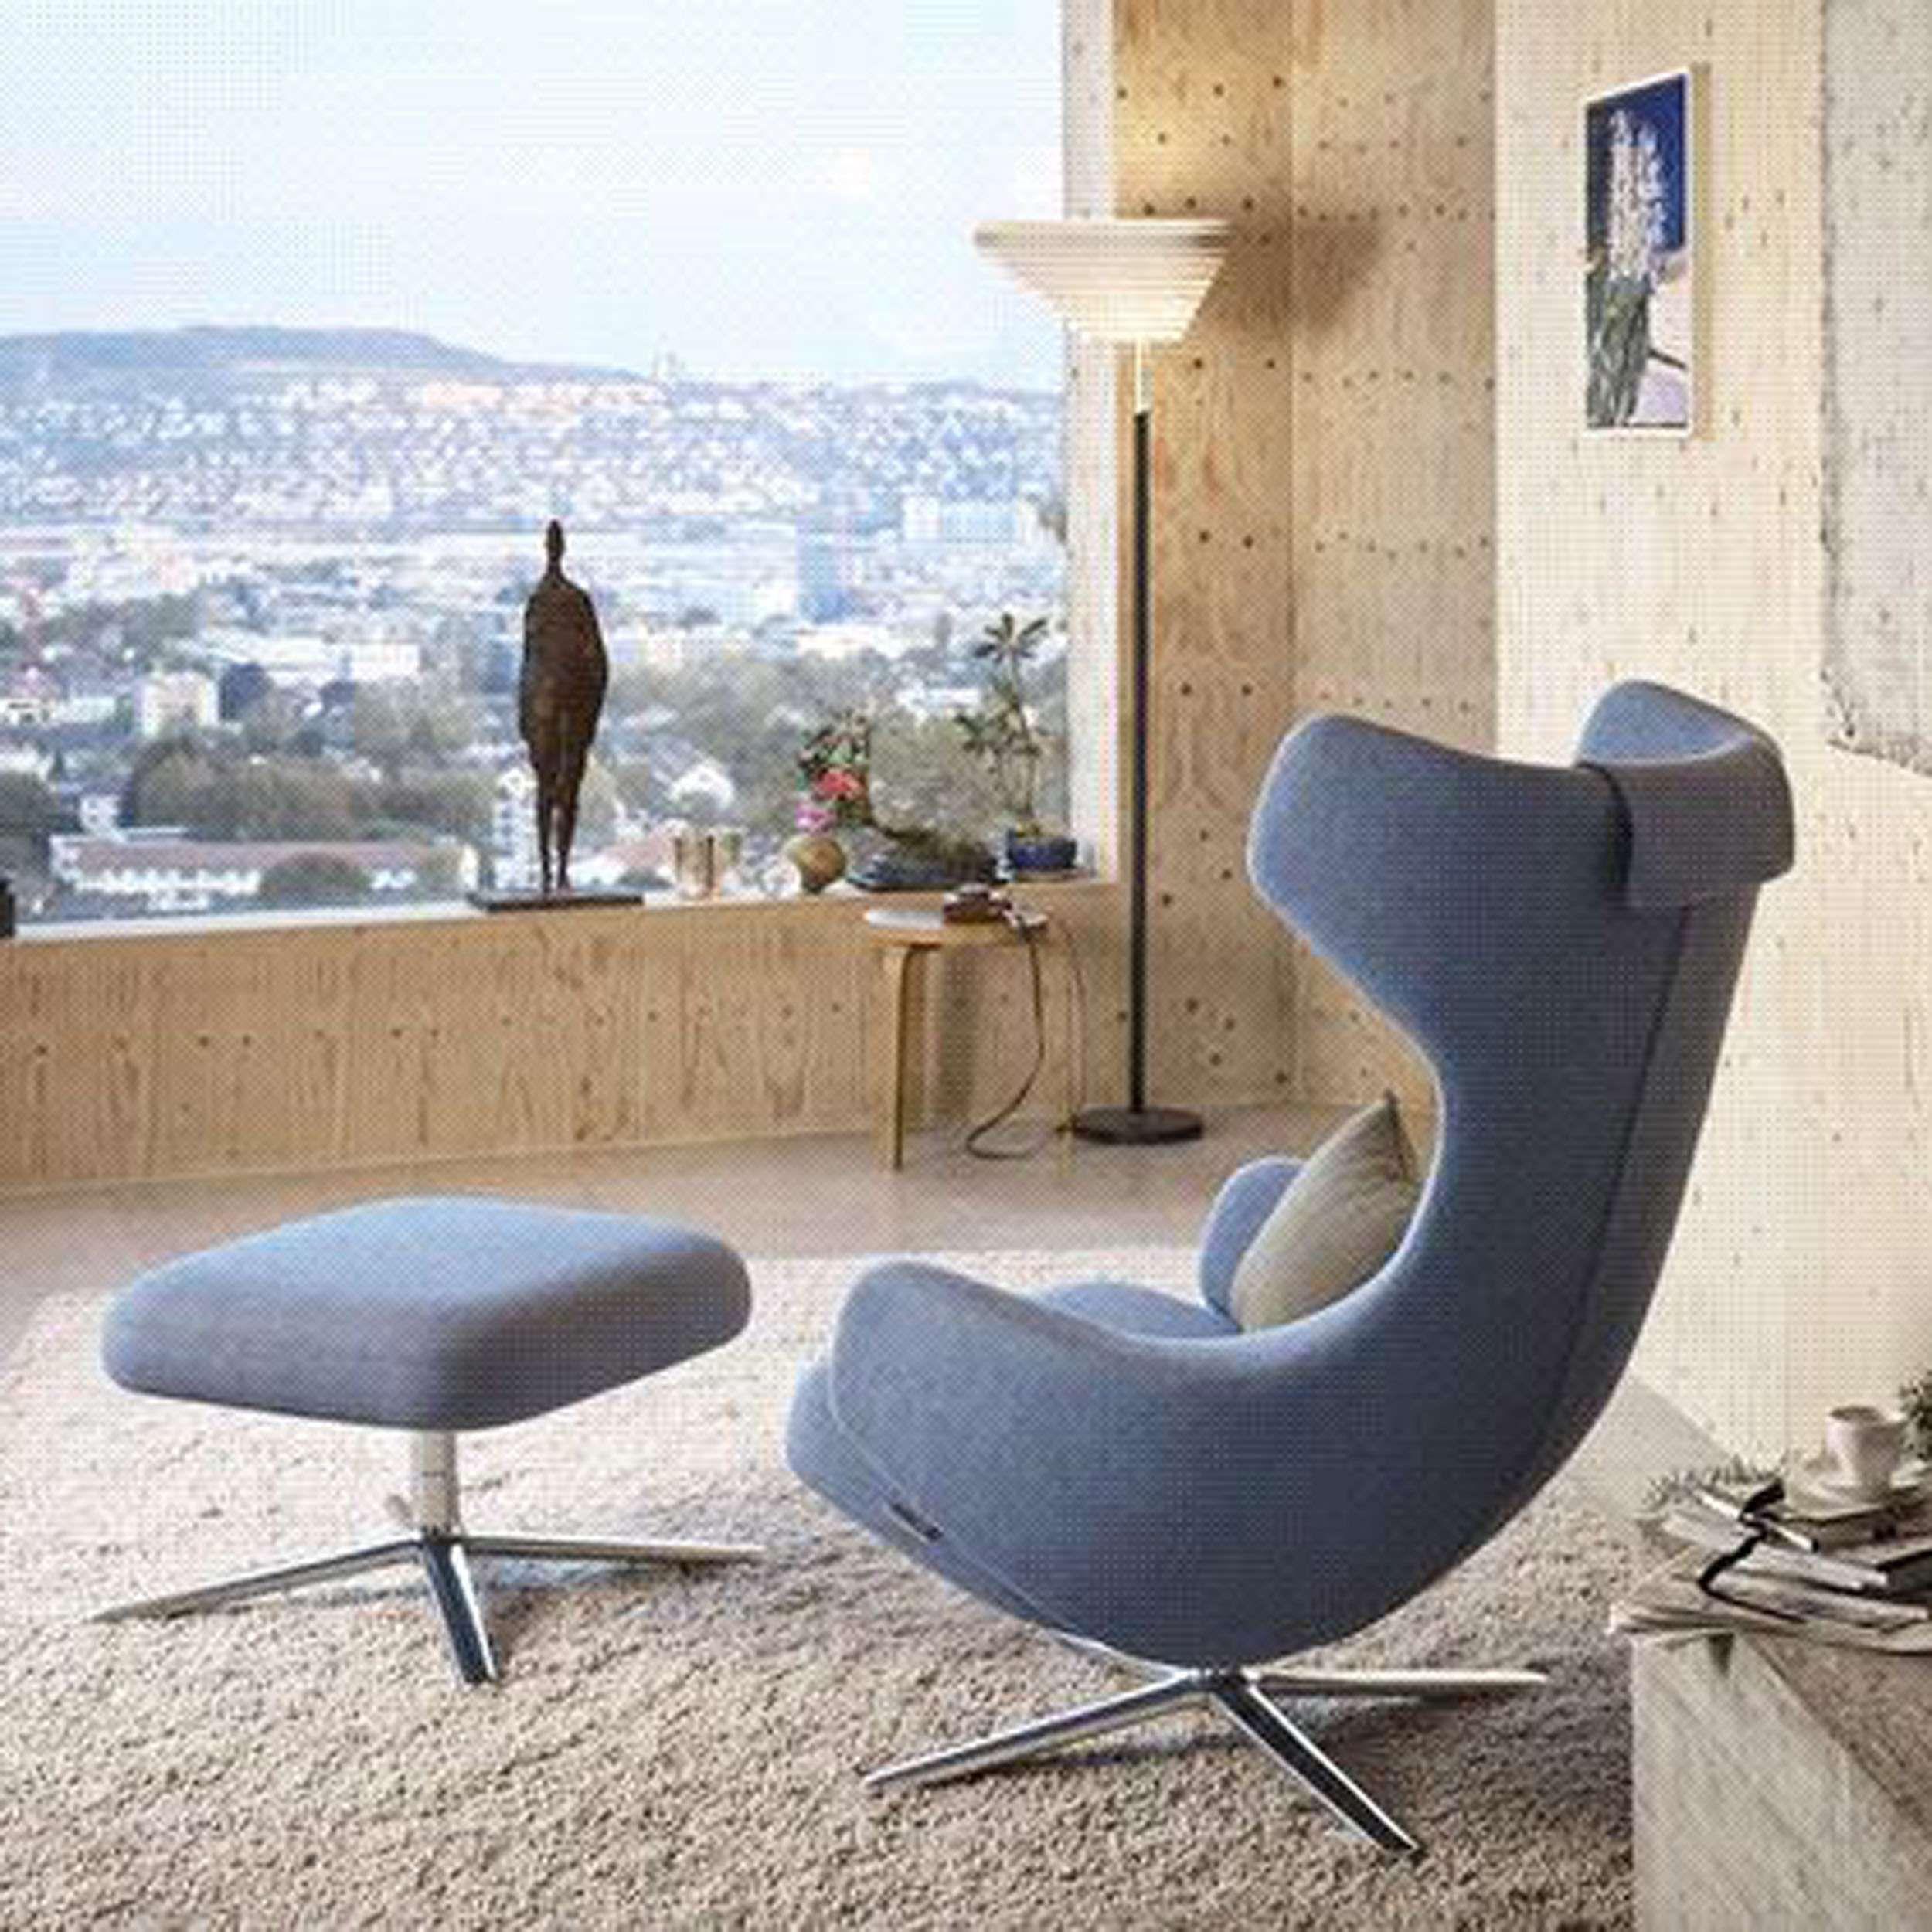 Grand Repos Ottoman Lounge Sessel Mit Fuß Teil Moebel Suchmaschine Ladendirekt De Stoelen Interieur Huis